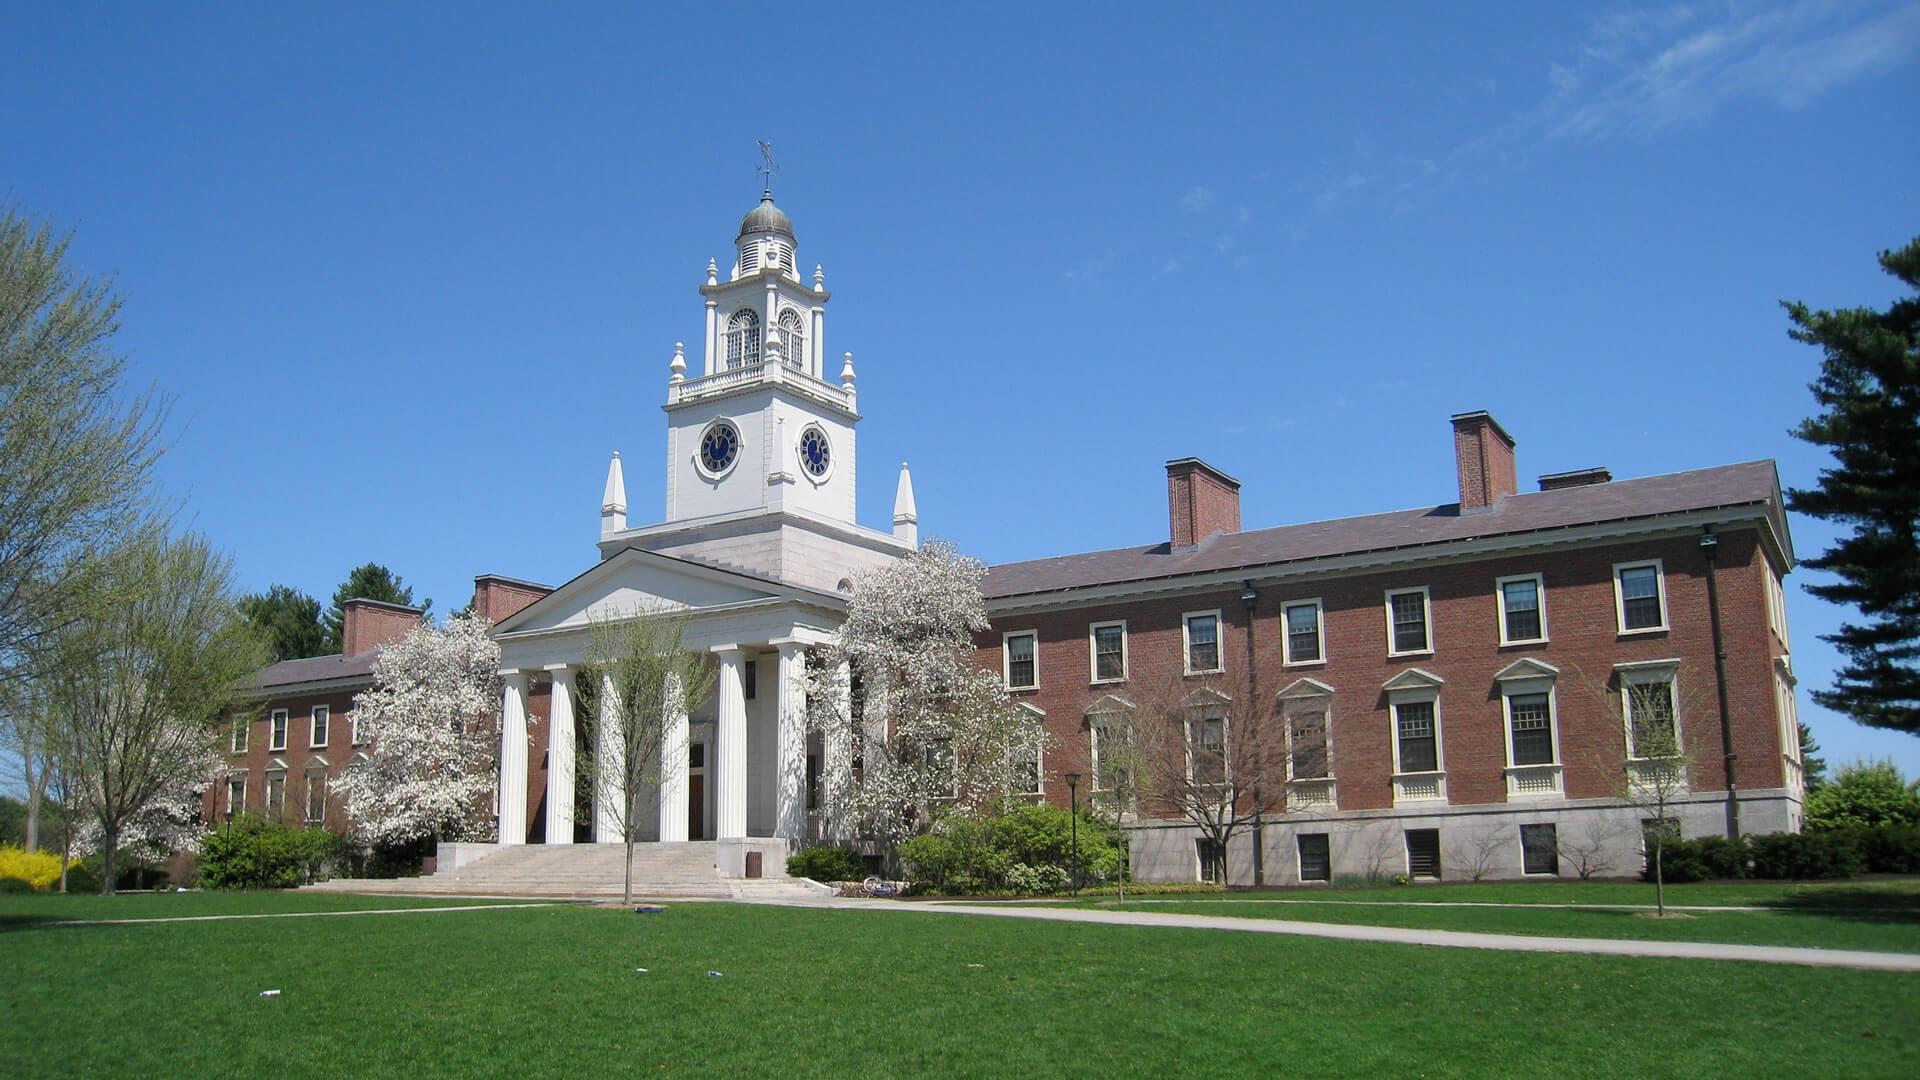 Phillips Academy